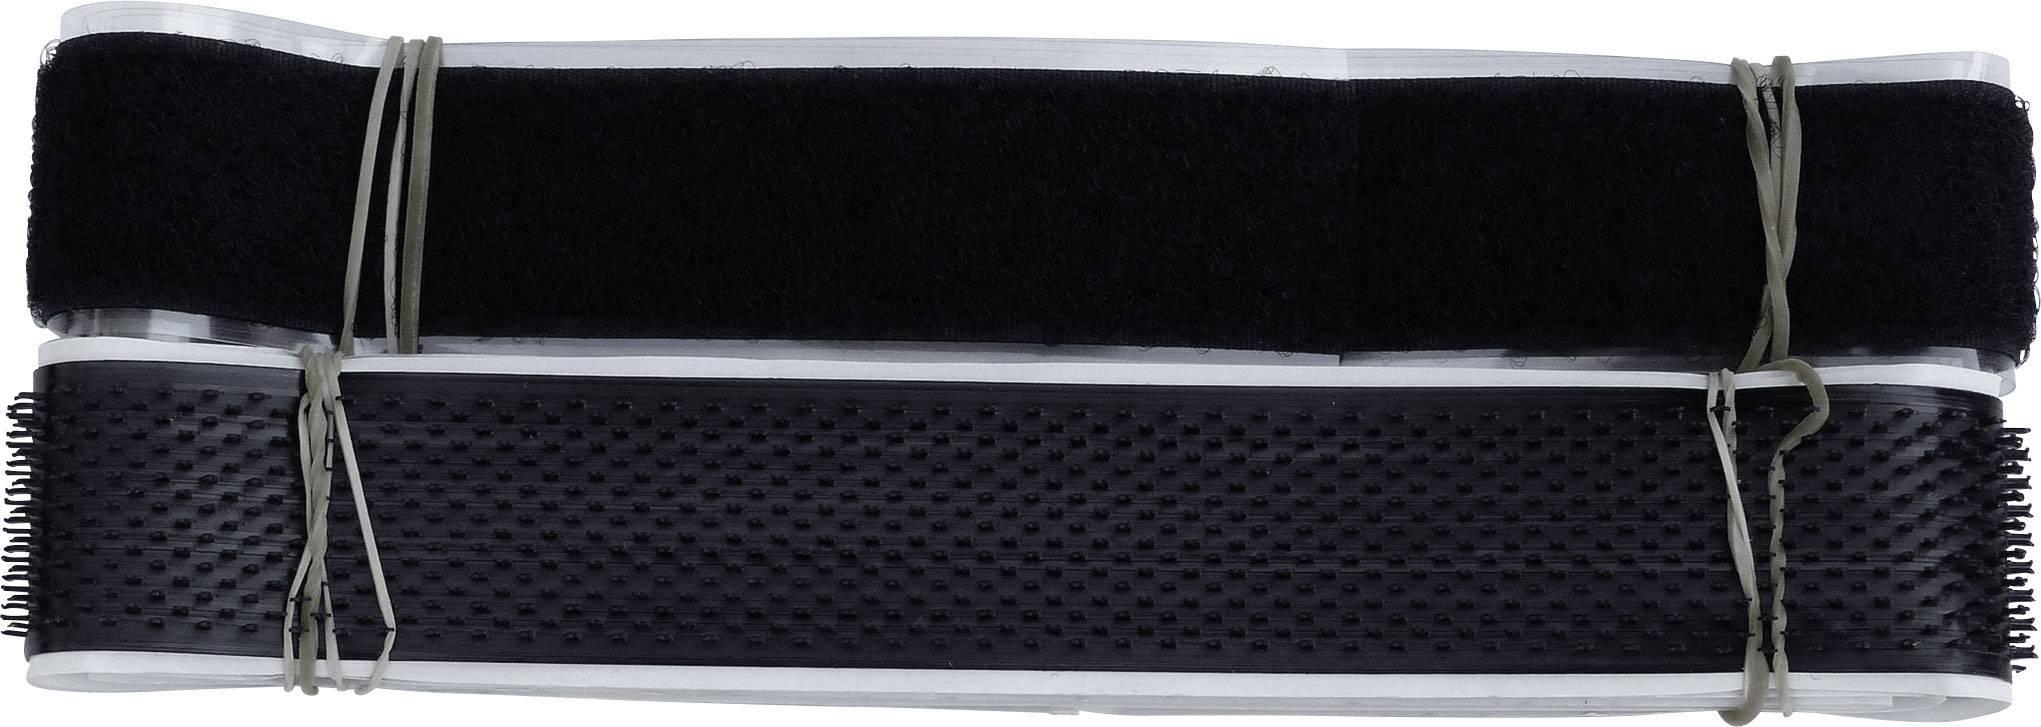 Lepicí pásek se suchým zipem TRU COMPONENTS 905-MVA8-Bag, (d x š) 1000 mm x 25 mm, 1 ks